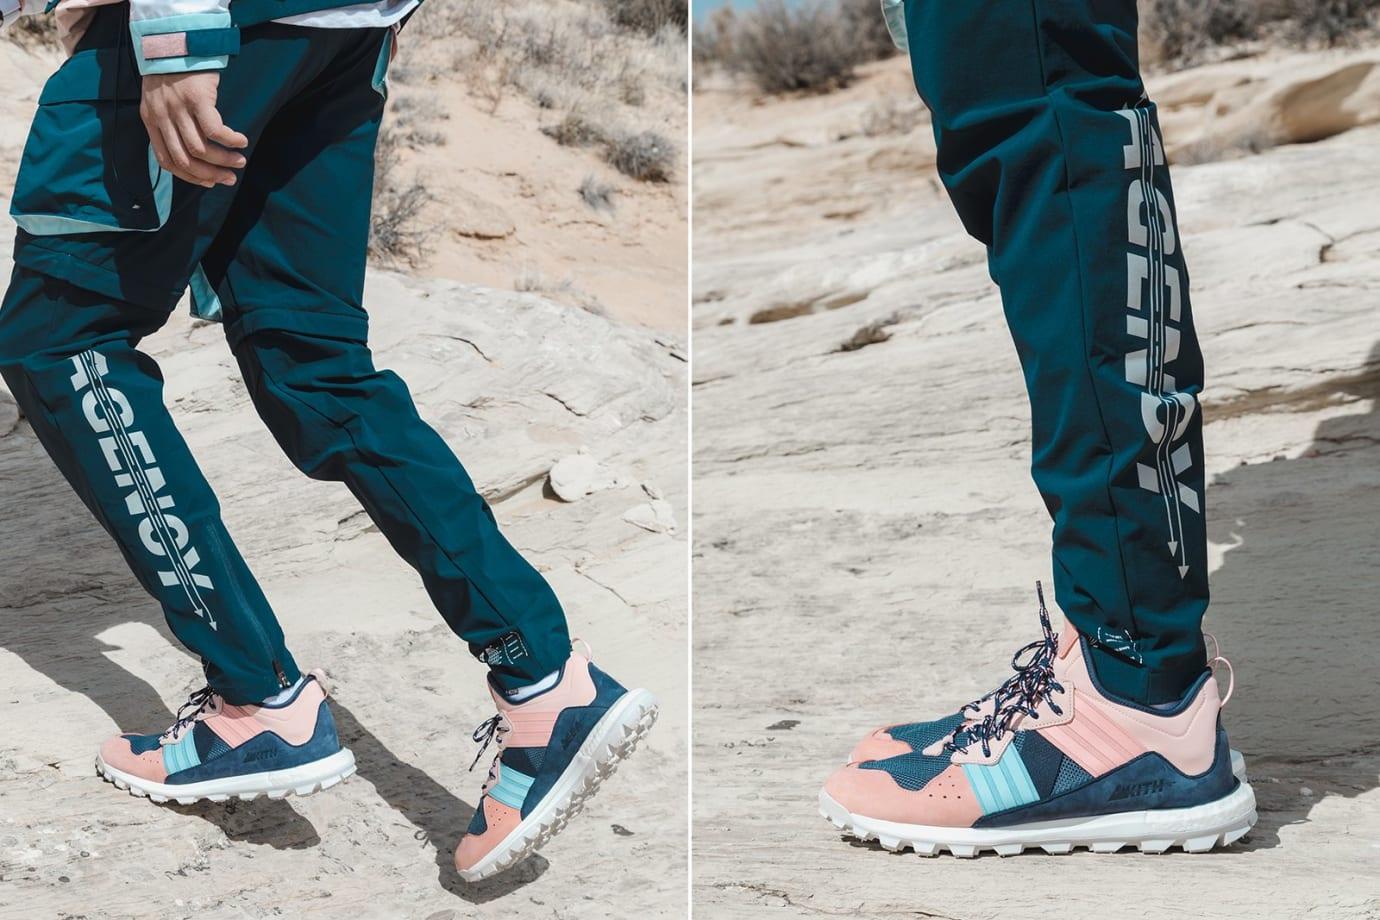 Kith x Adidas Terrex Response TR Boost (On-Foot)